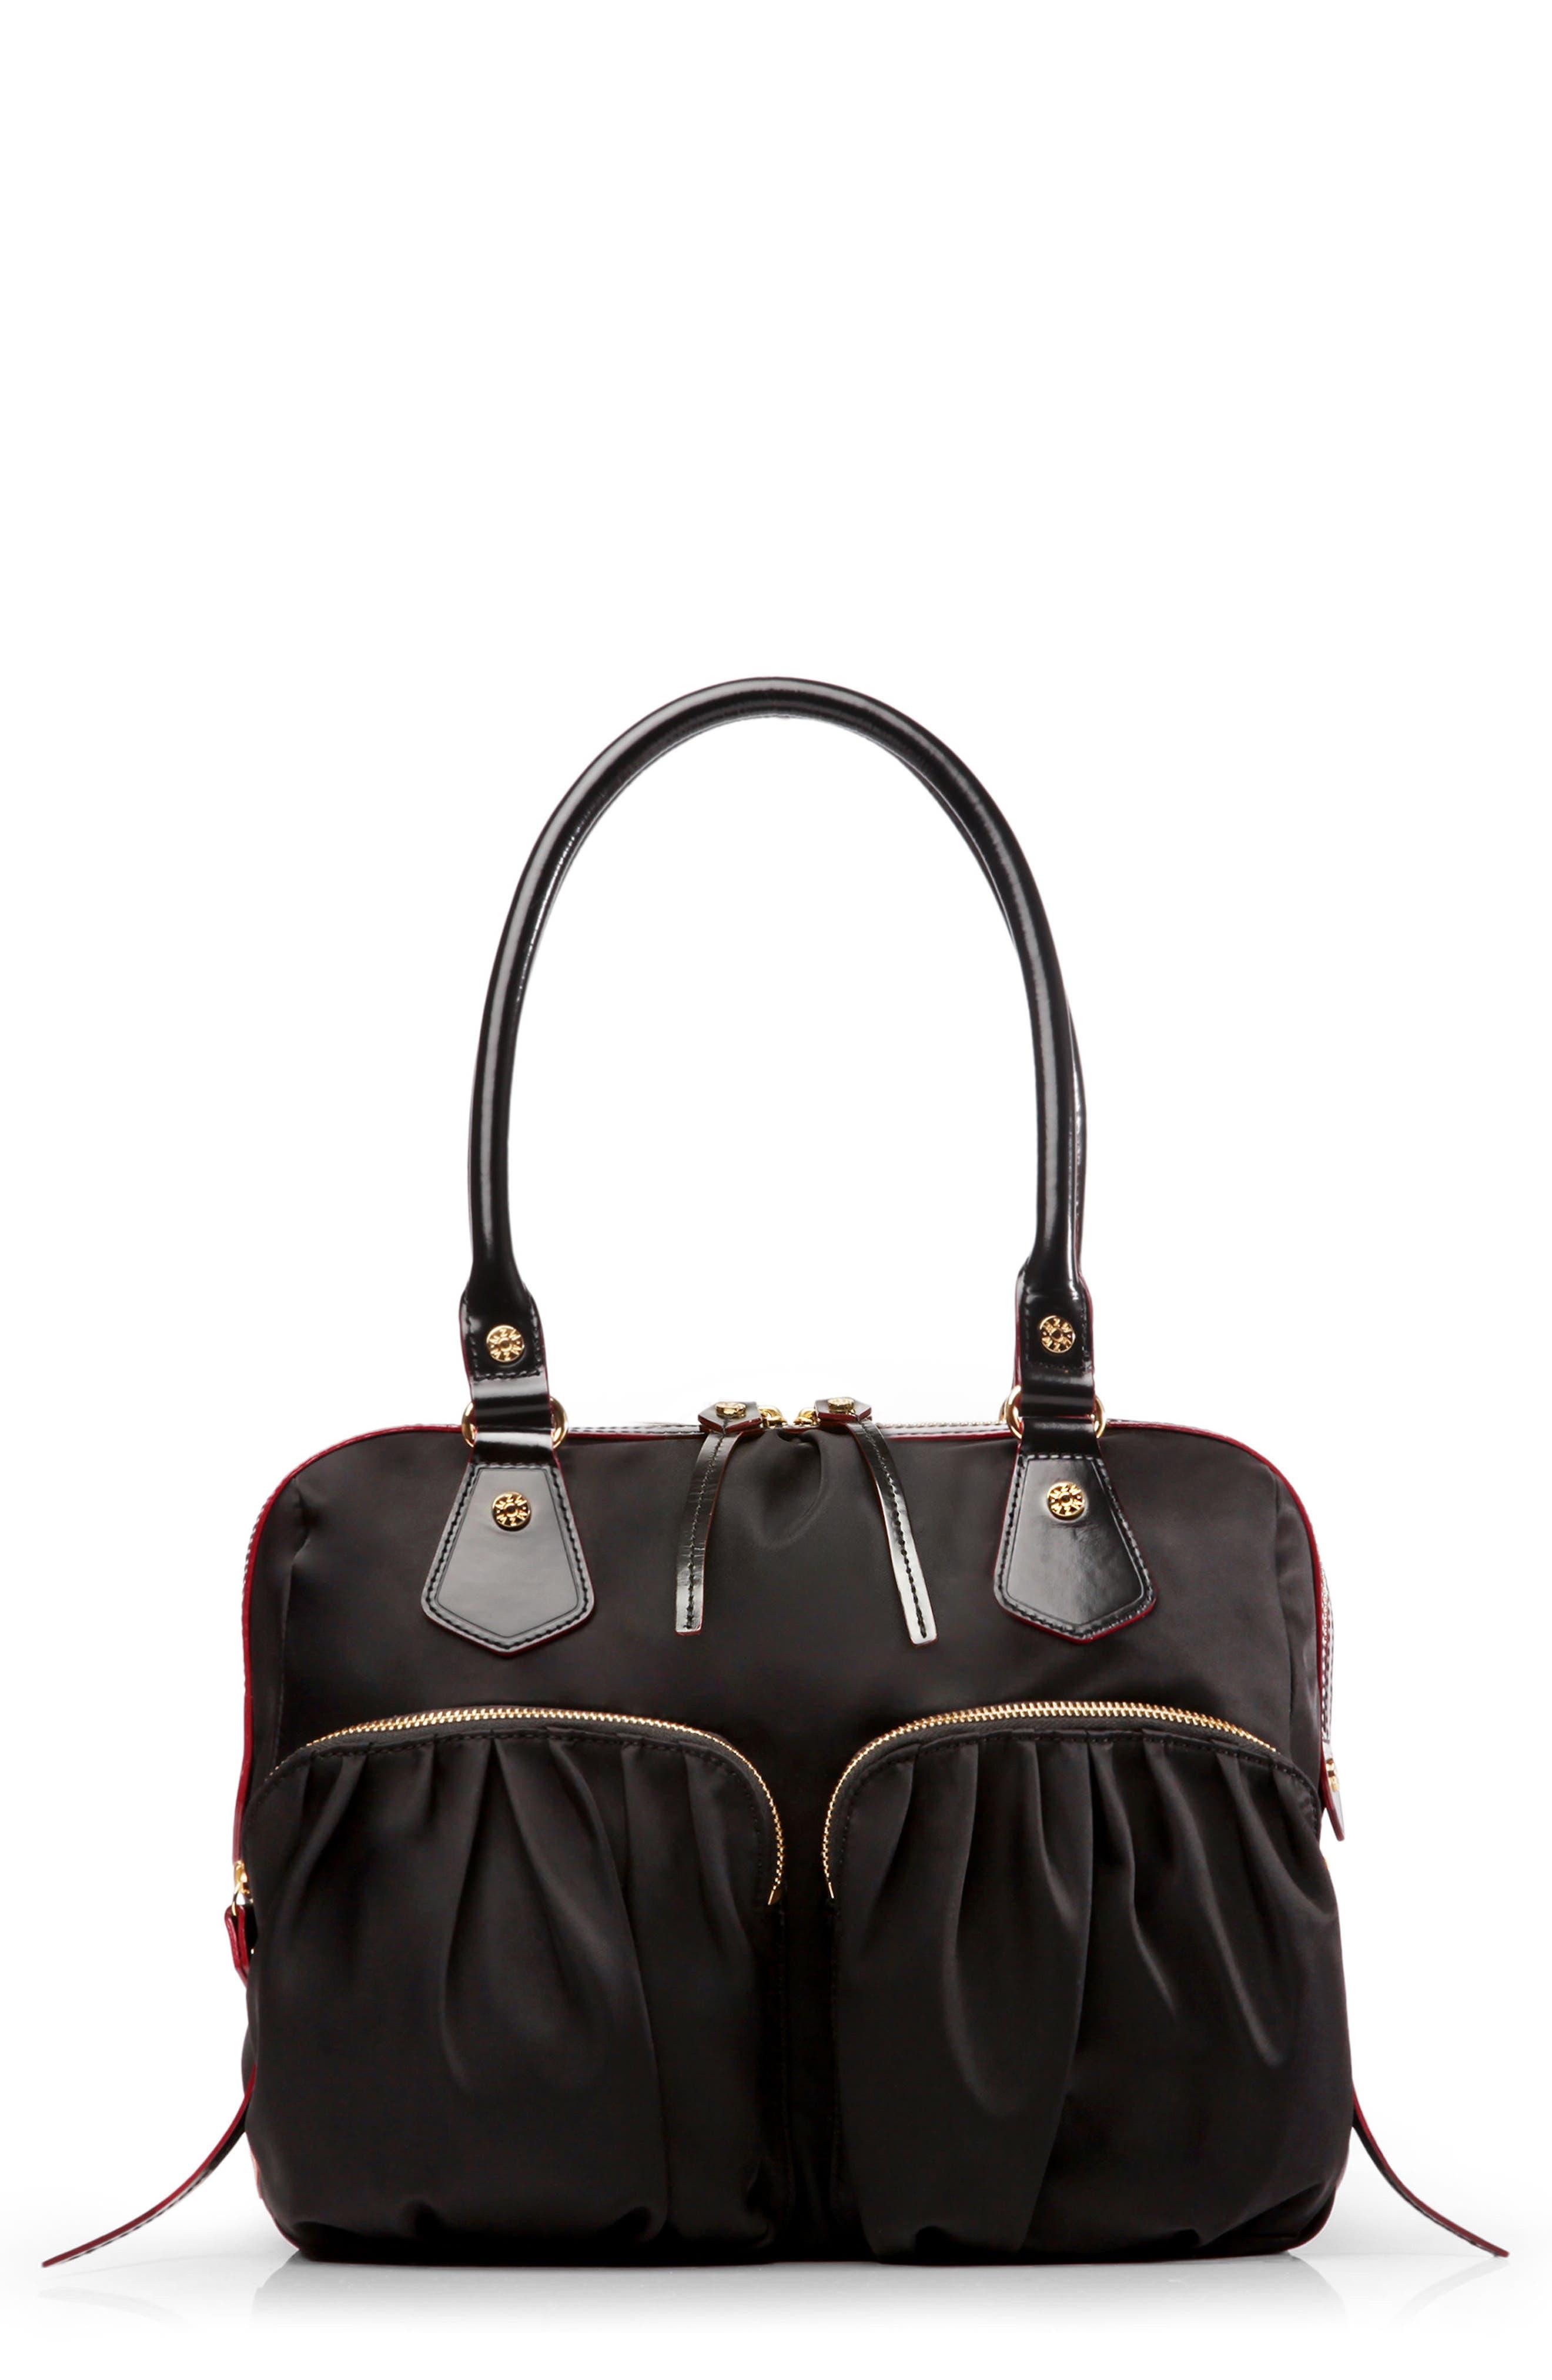 Alternate Image 1 Selected - MZ Wallace 'Jane' Bedford Nylon Handbag